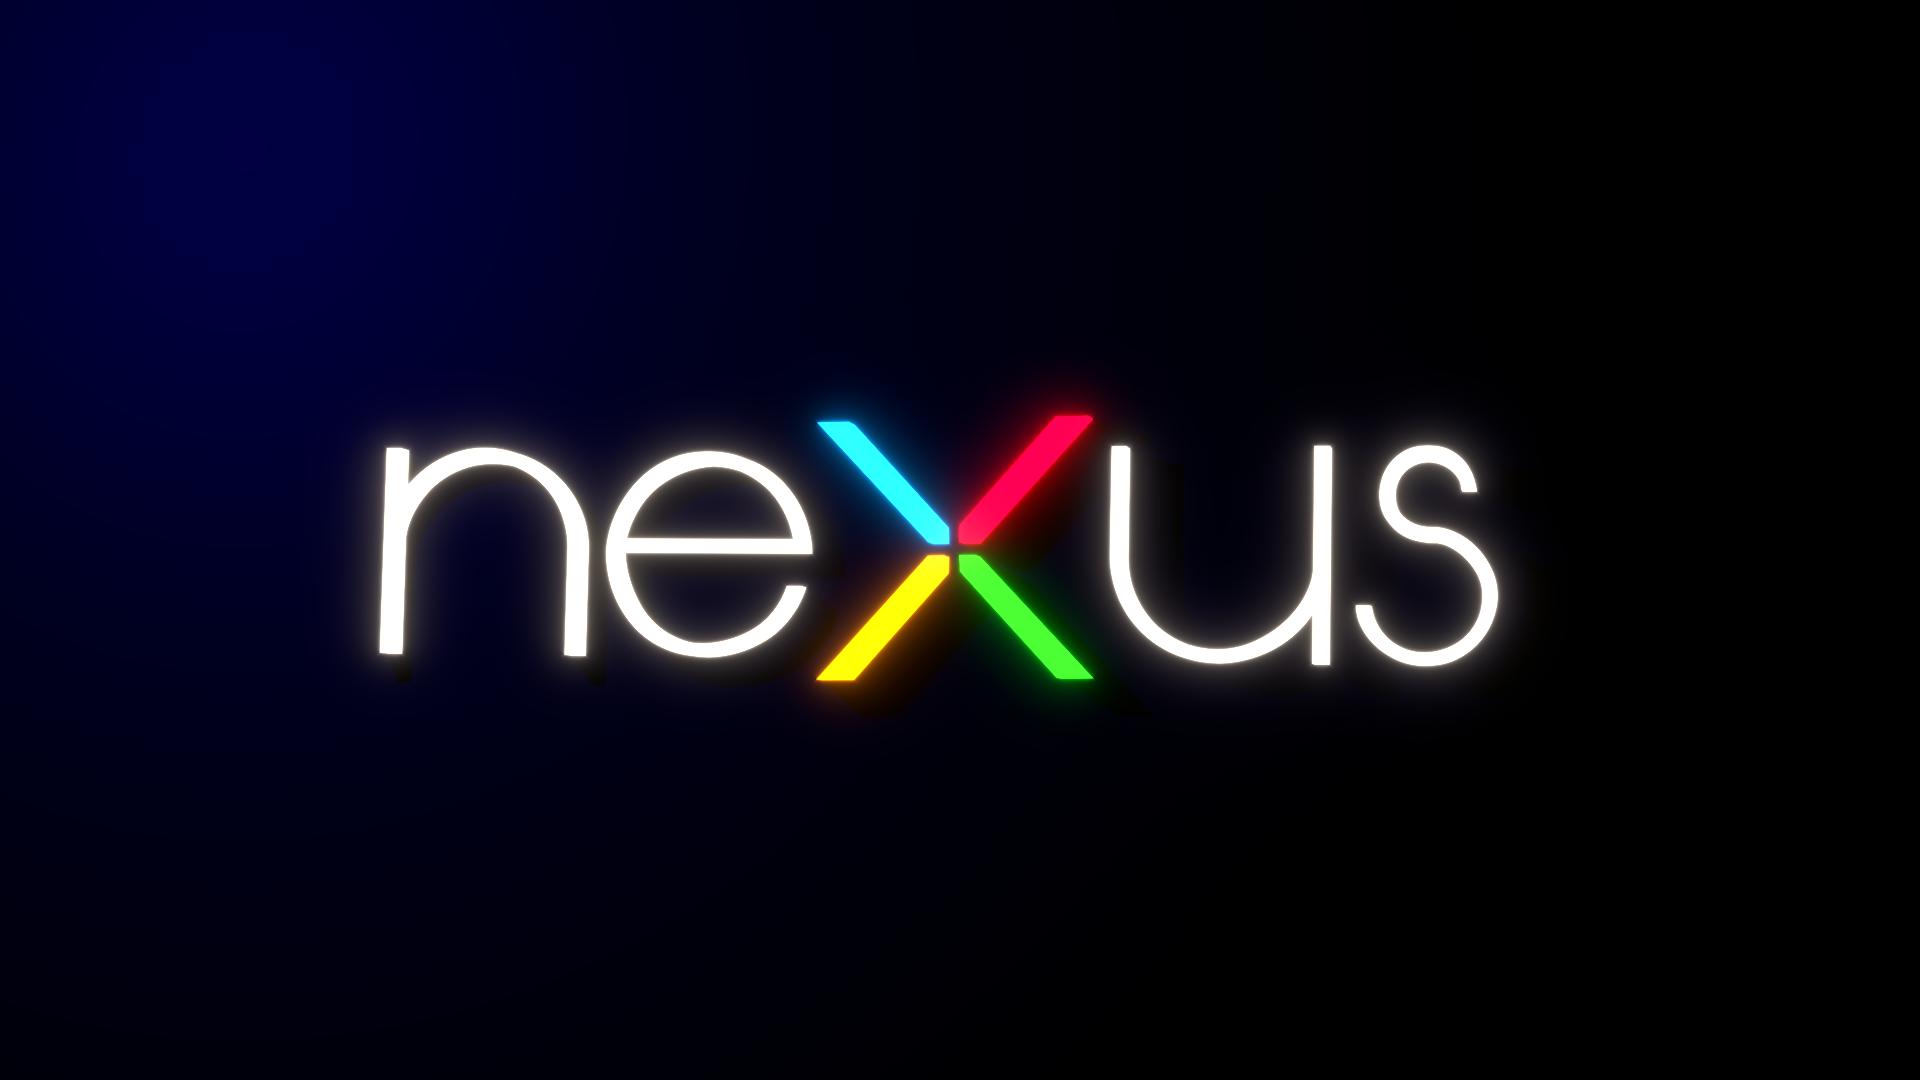 google-i-o-nexus-logo